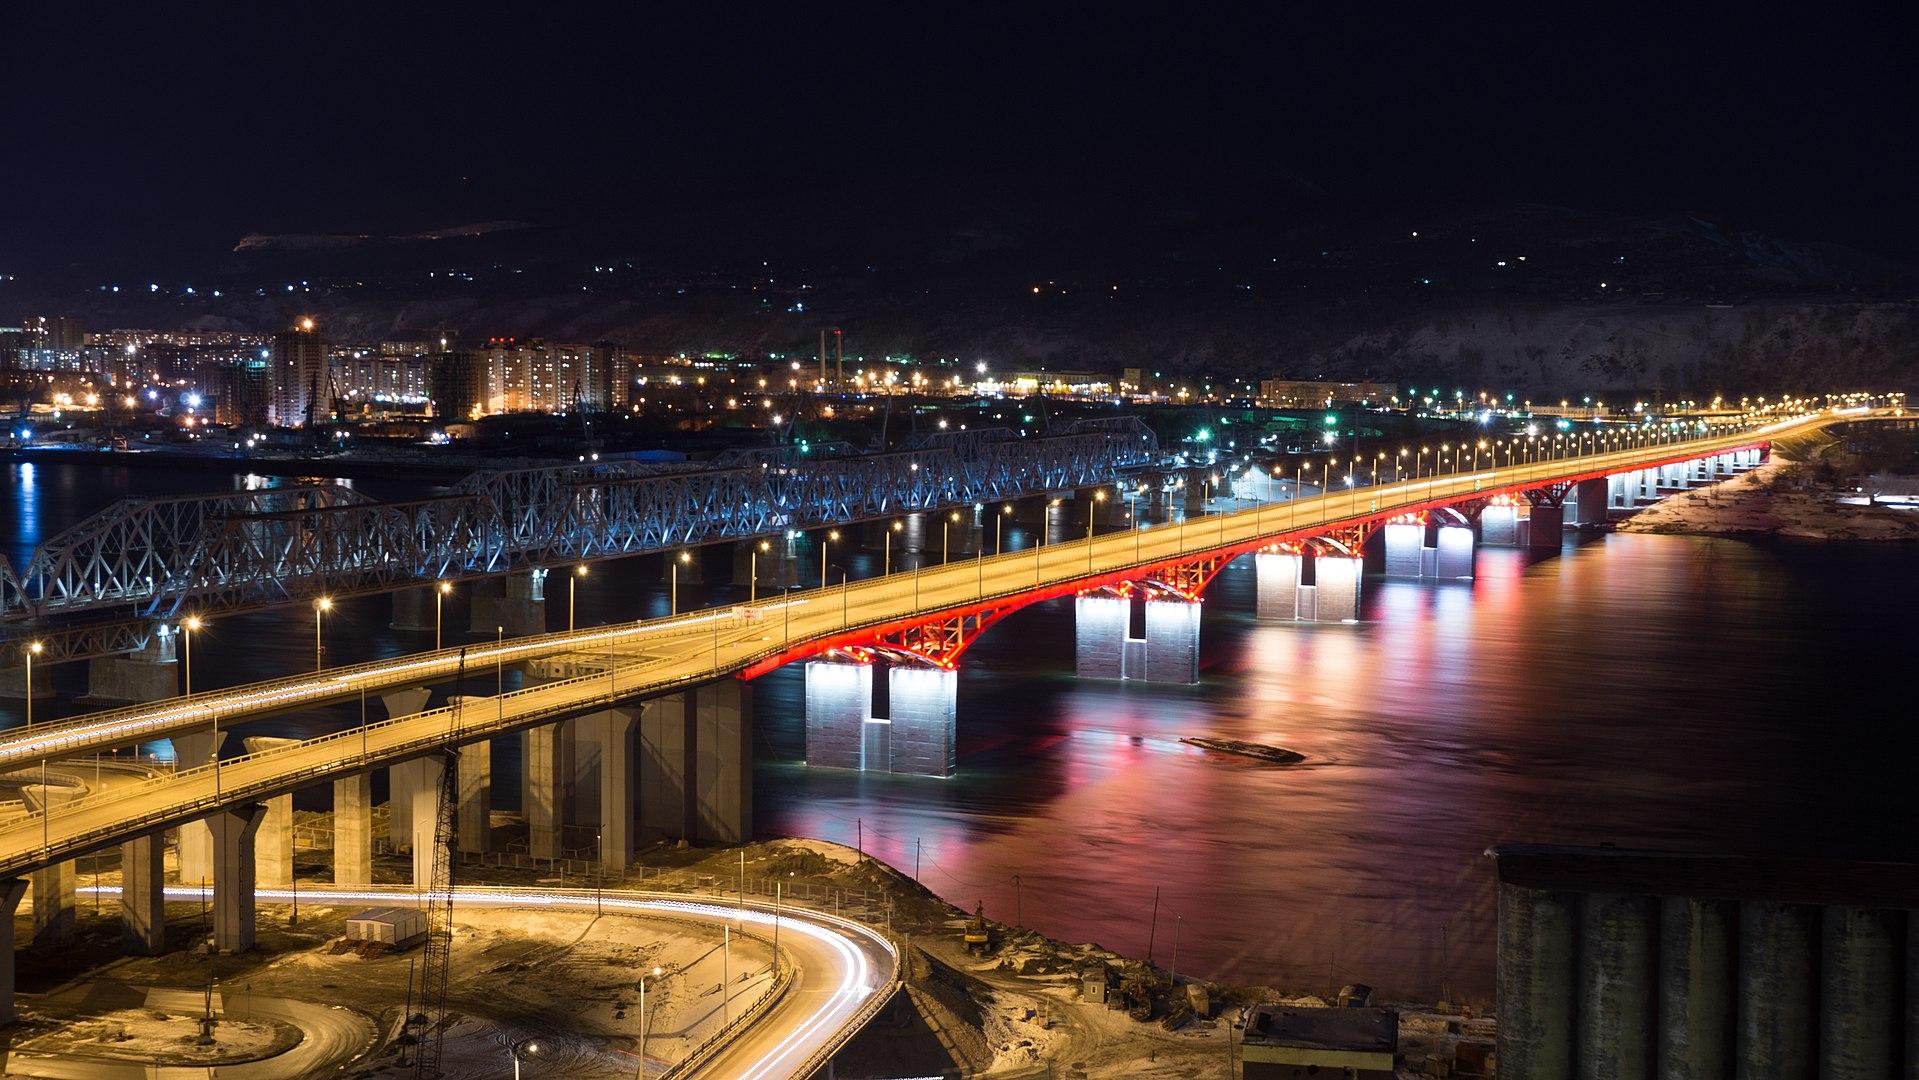 nikolaevsky bridge krasnoyarsk